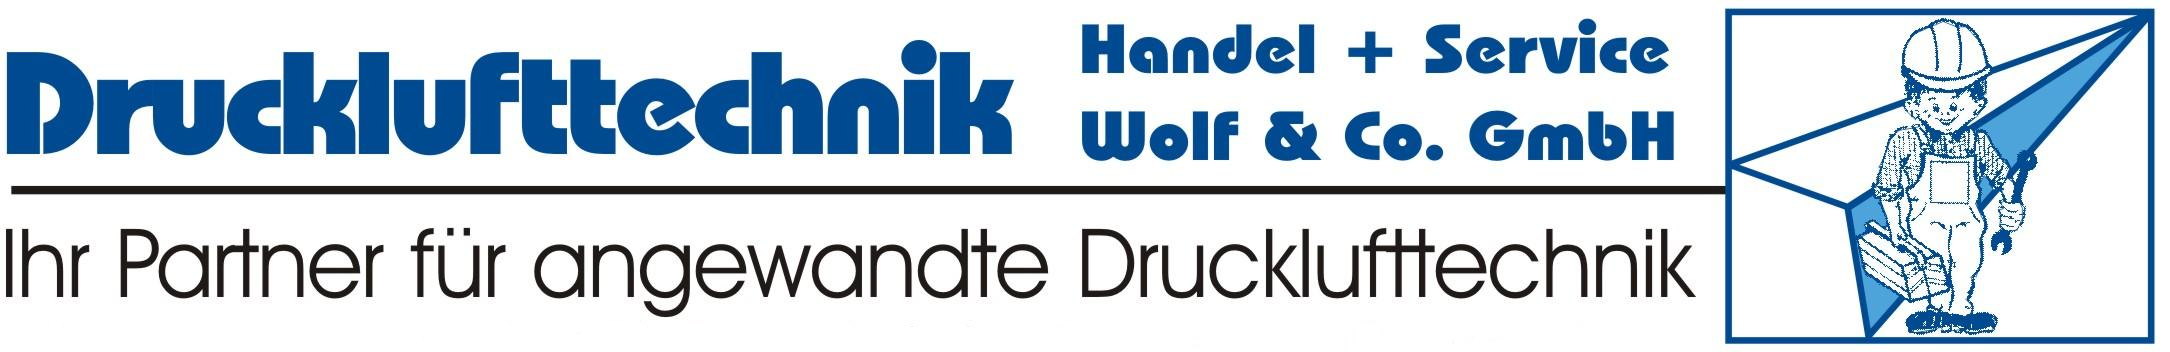 Drucklufttechnik Handel + Service Wolf & Co.GmbH